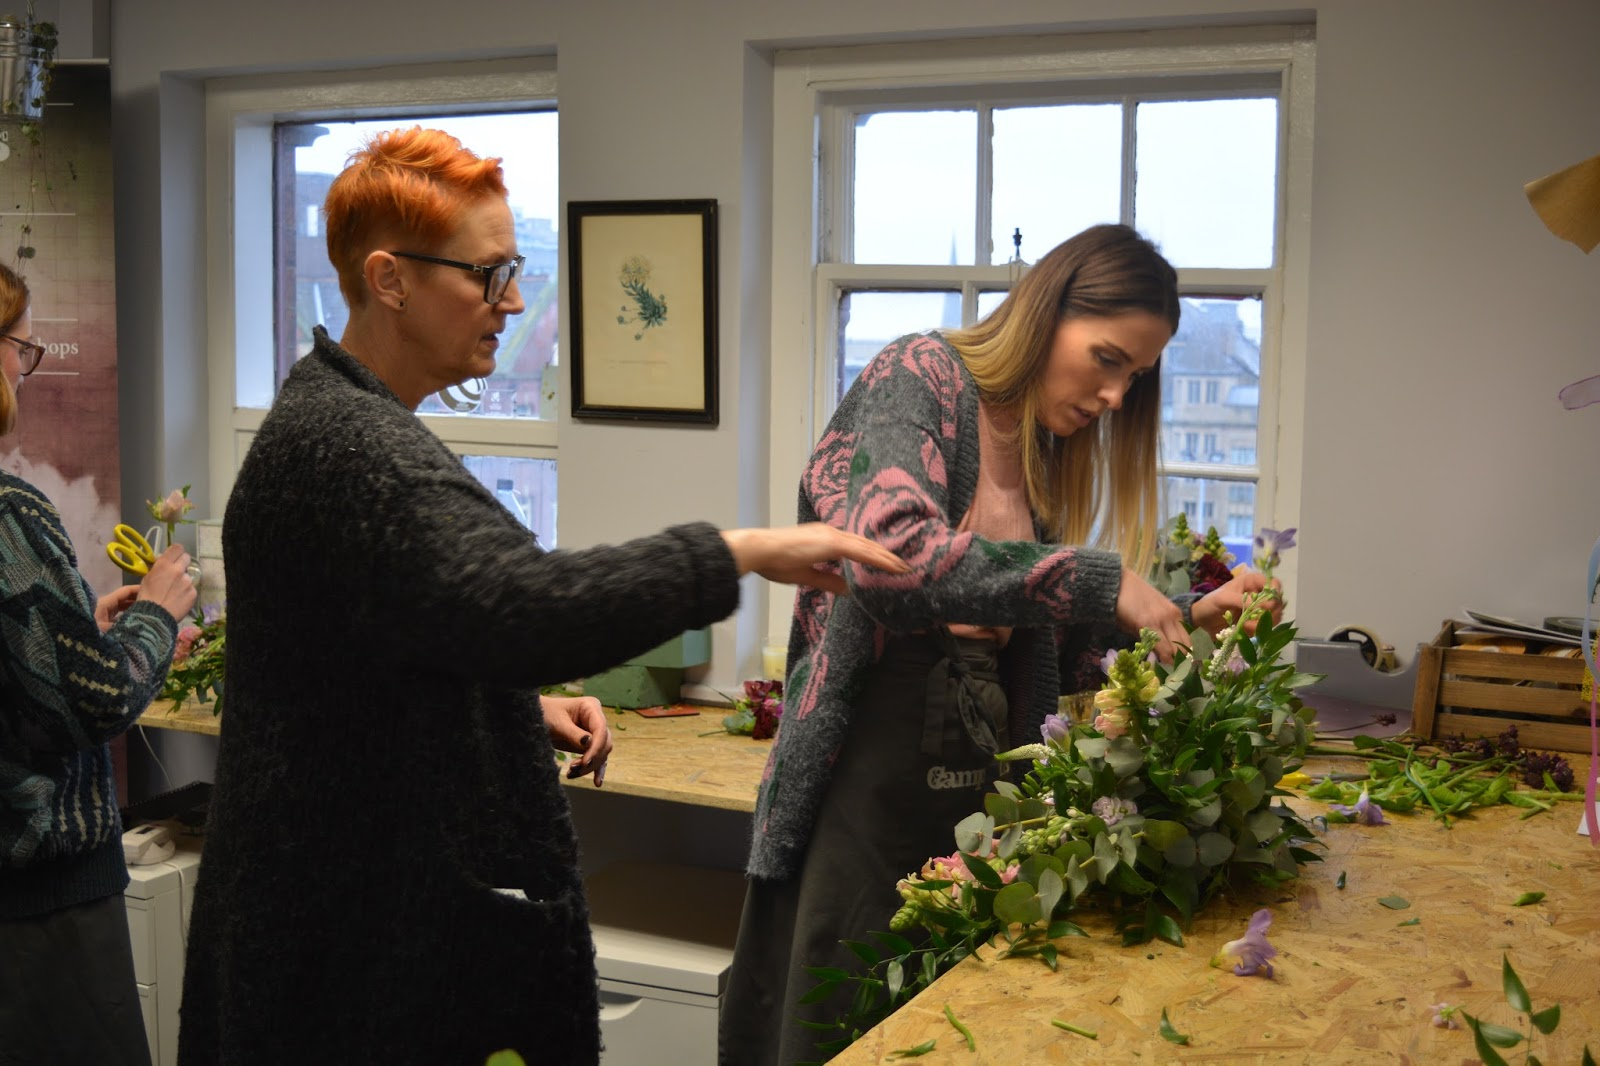 Campbells Flowers Career Change Workshops Our New Campbells